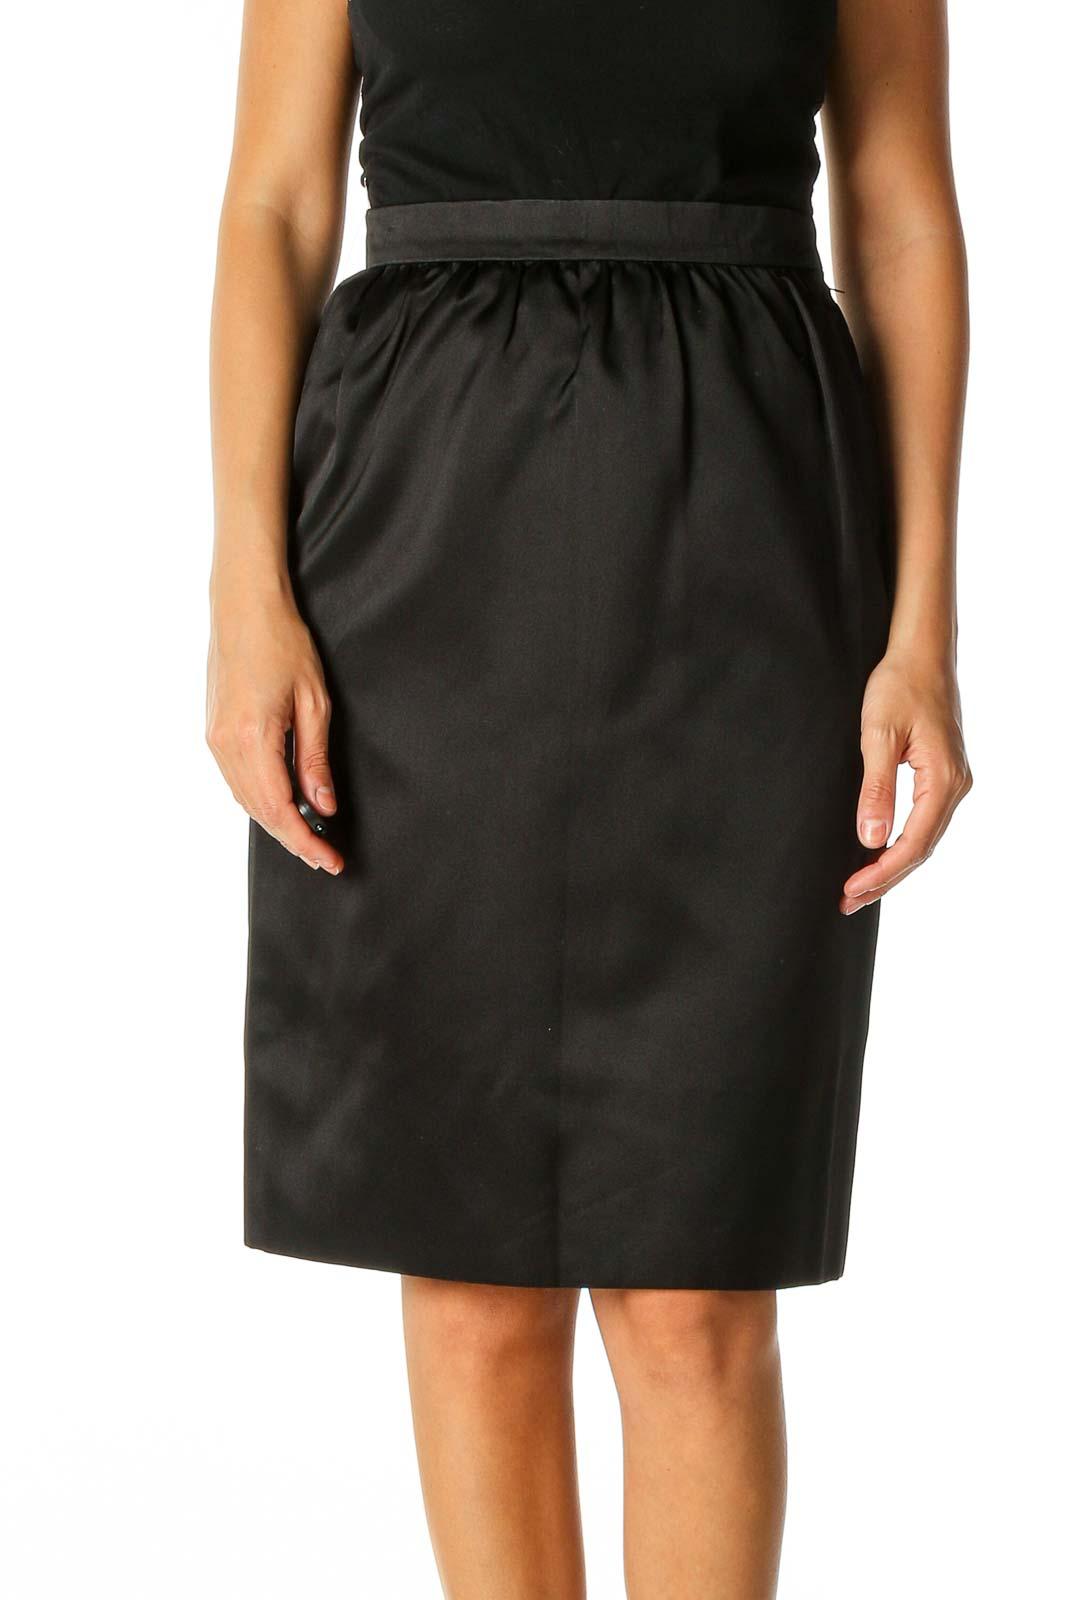 Black Solid Brunch Straight Skirt Front